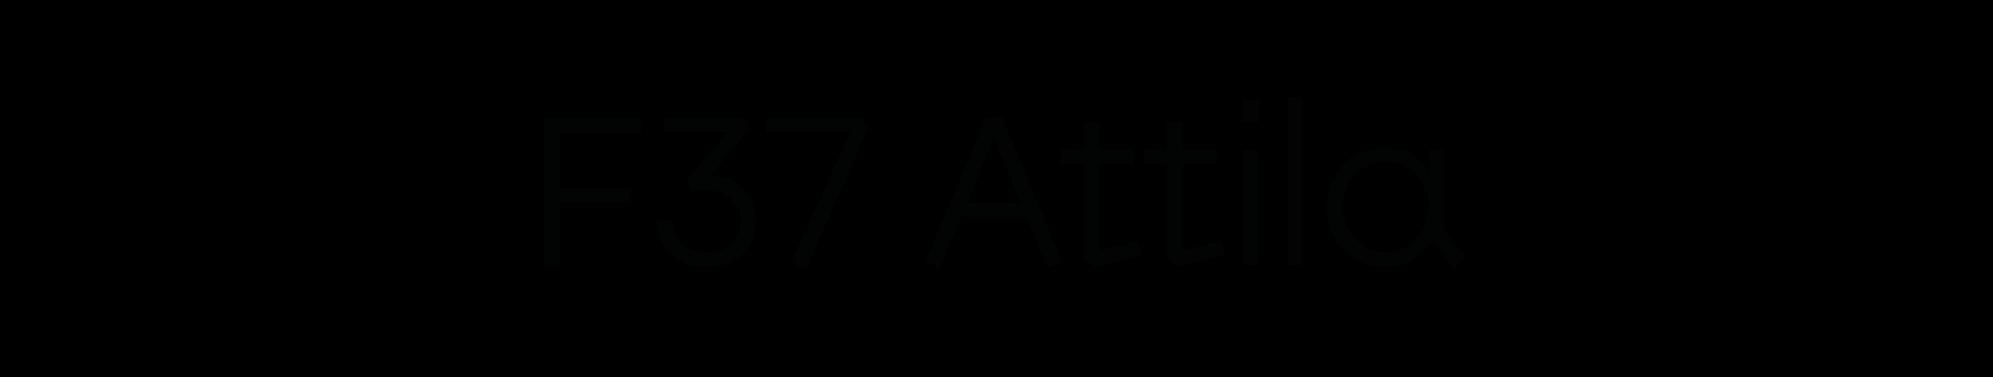 F37 Attila